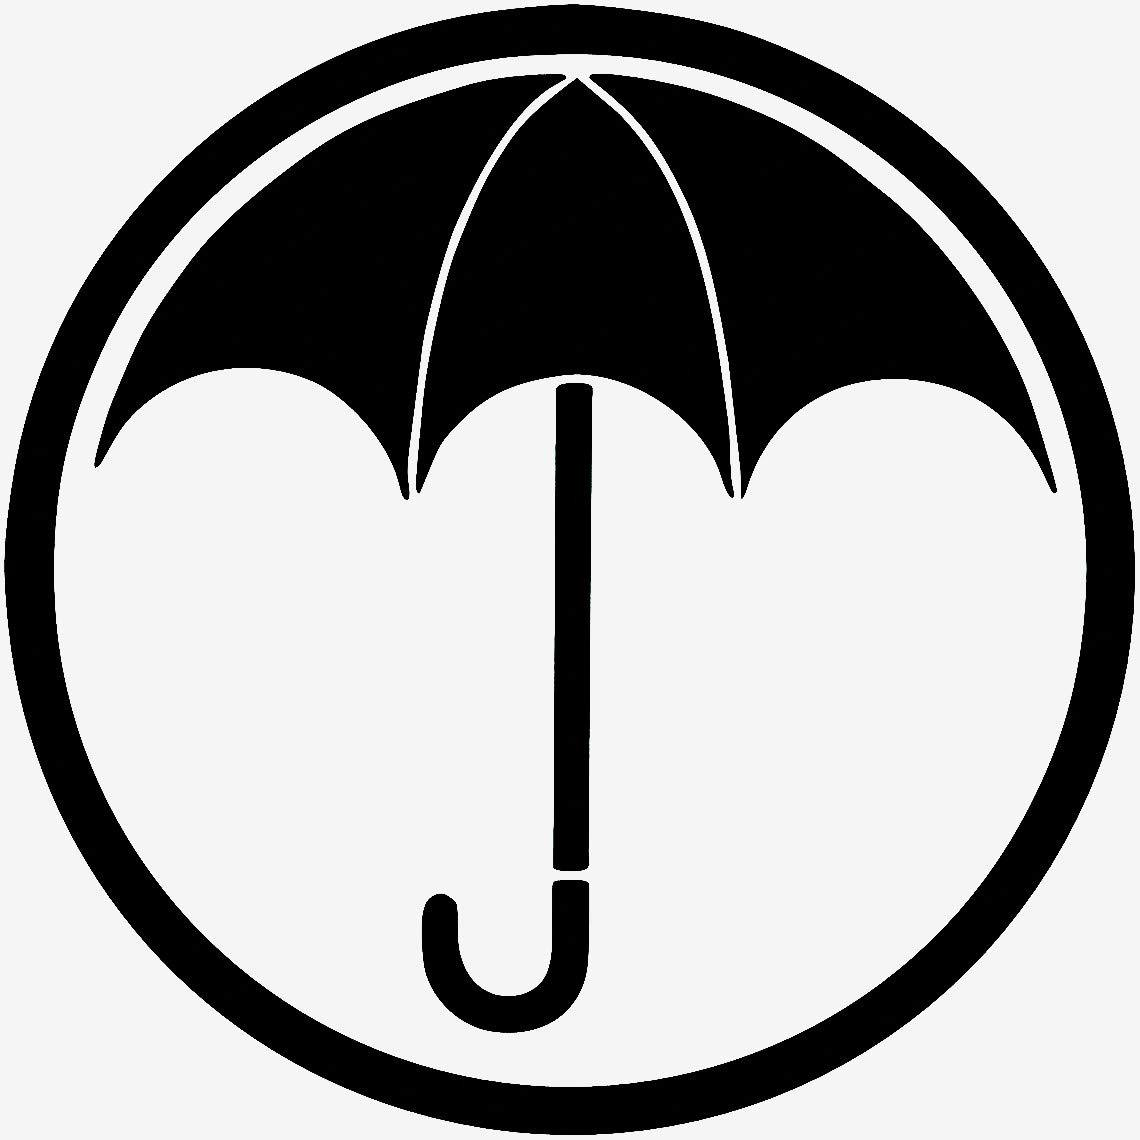 Umbrella Academy: Klaus Hargreeves (#4) - Pop! Vinyl Figure image